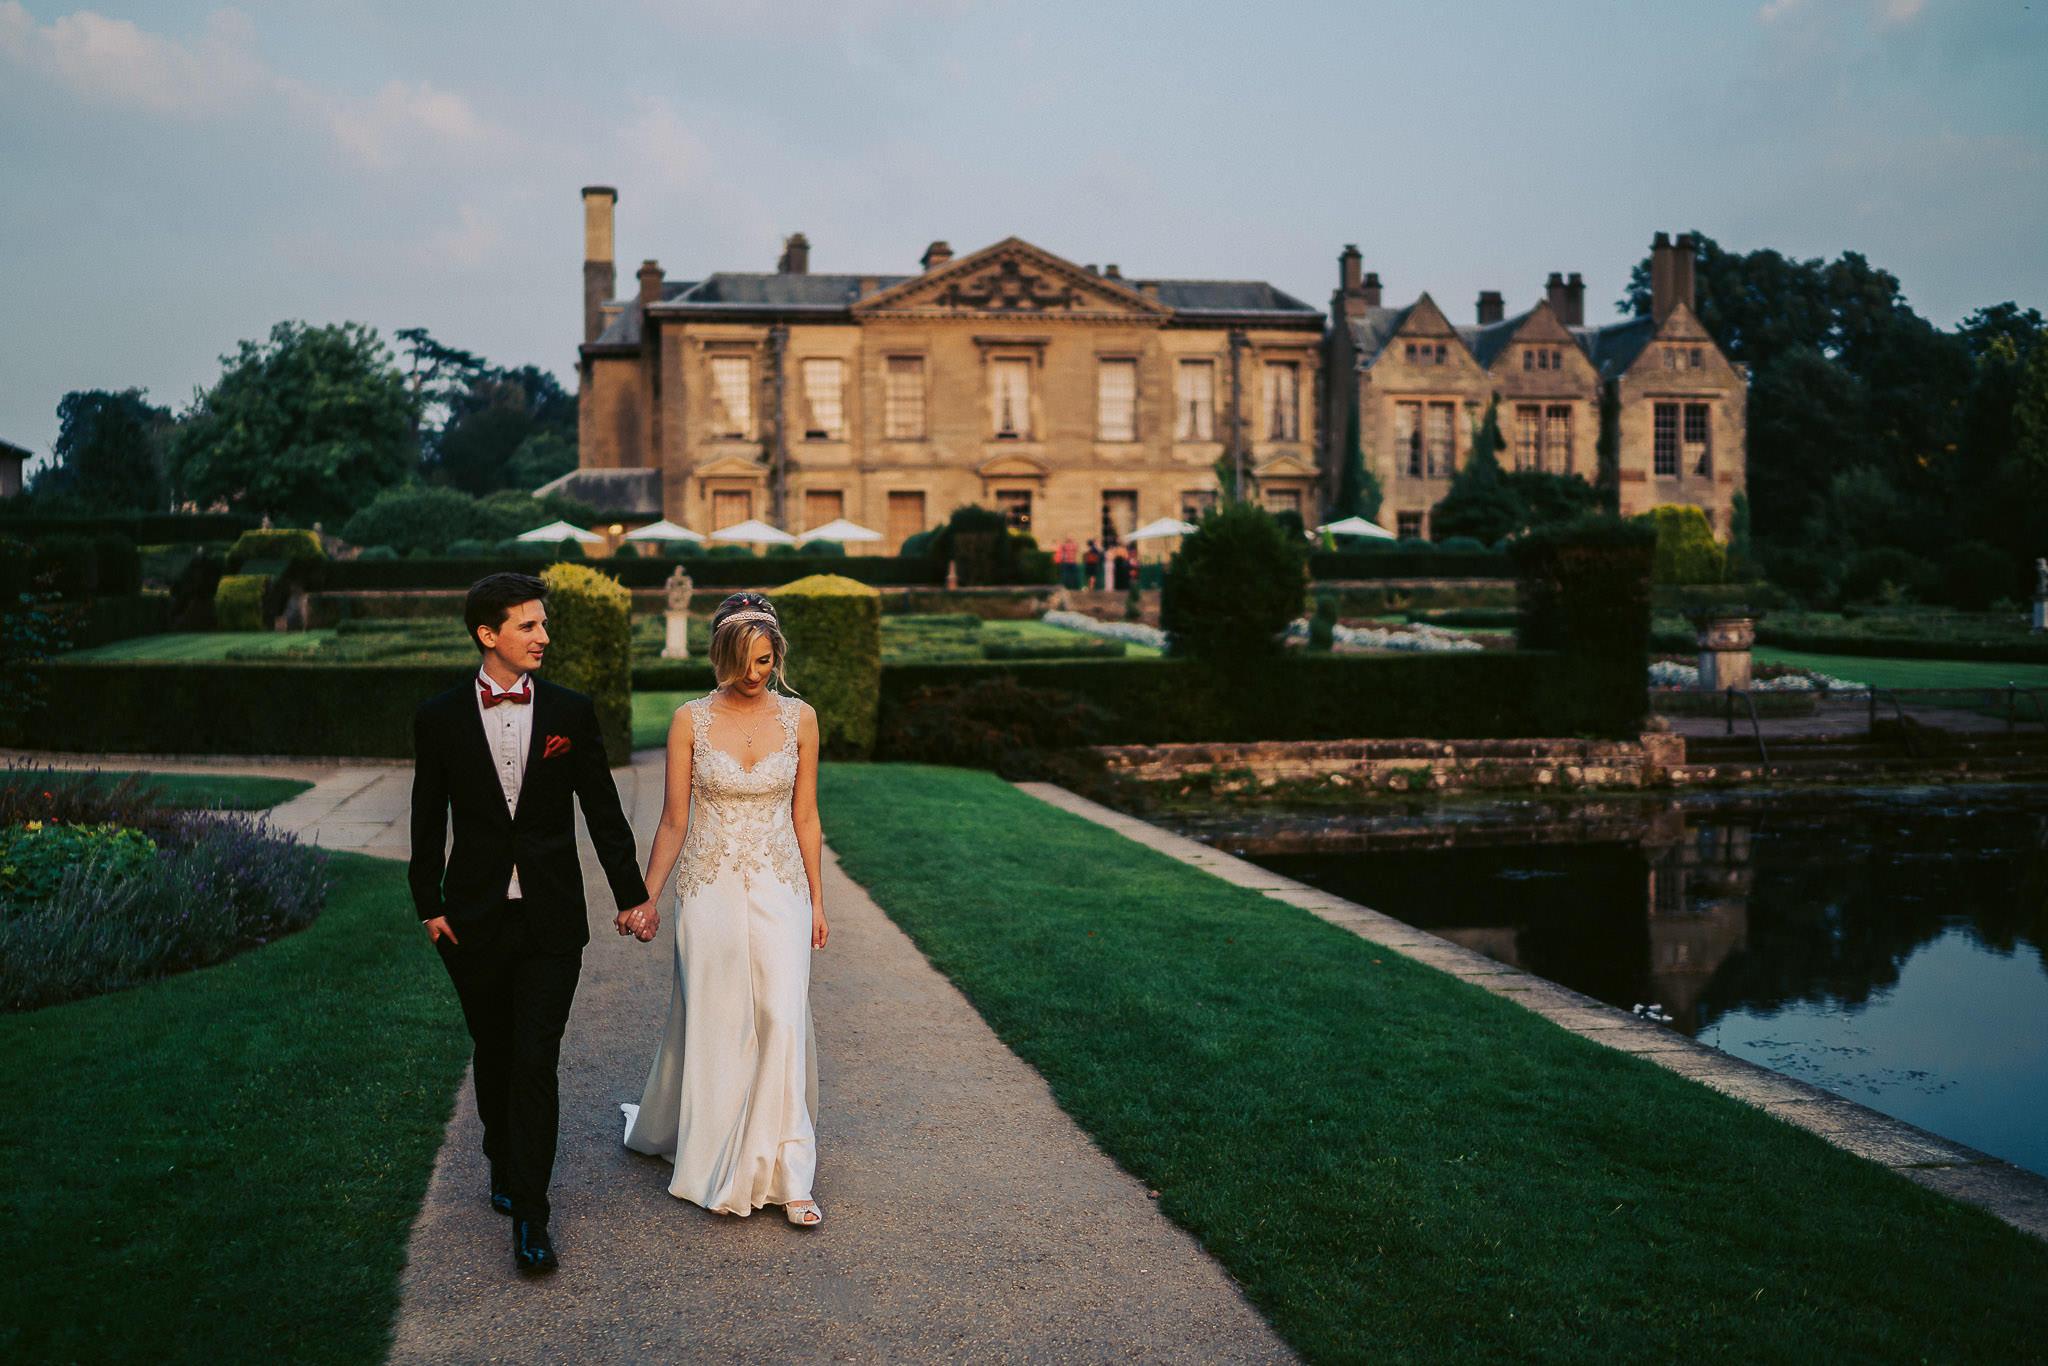 Staffordshire-Wedding-Photographer-210.jpg